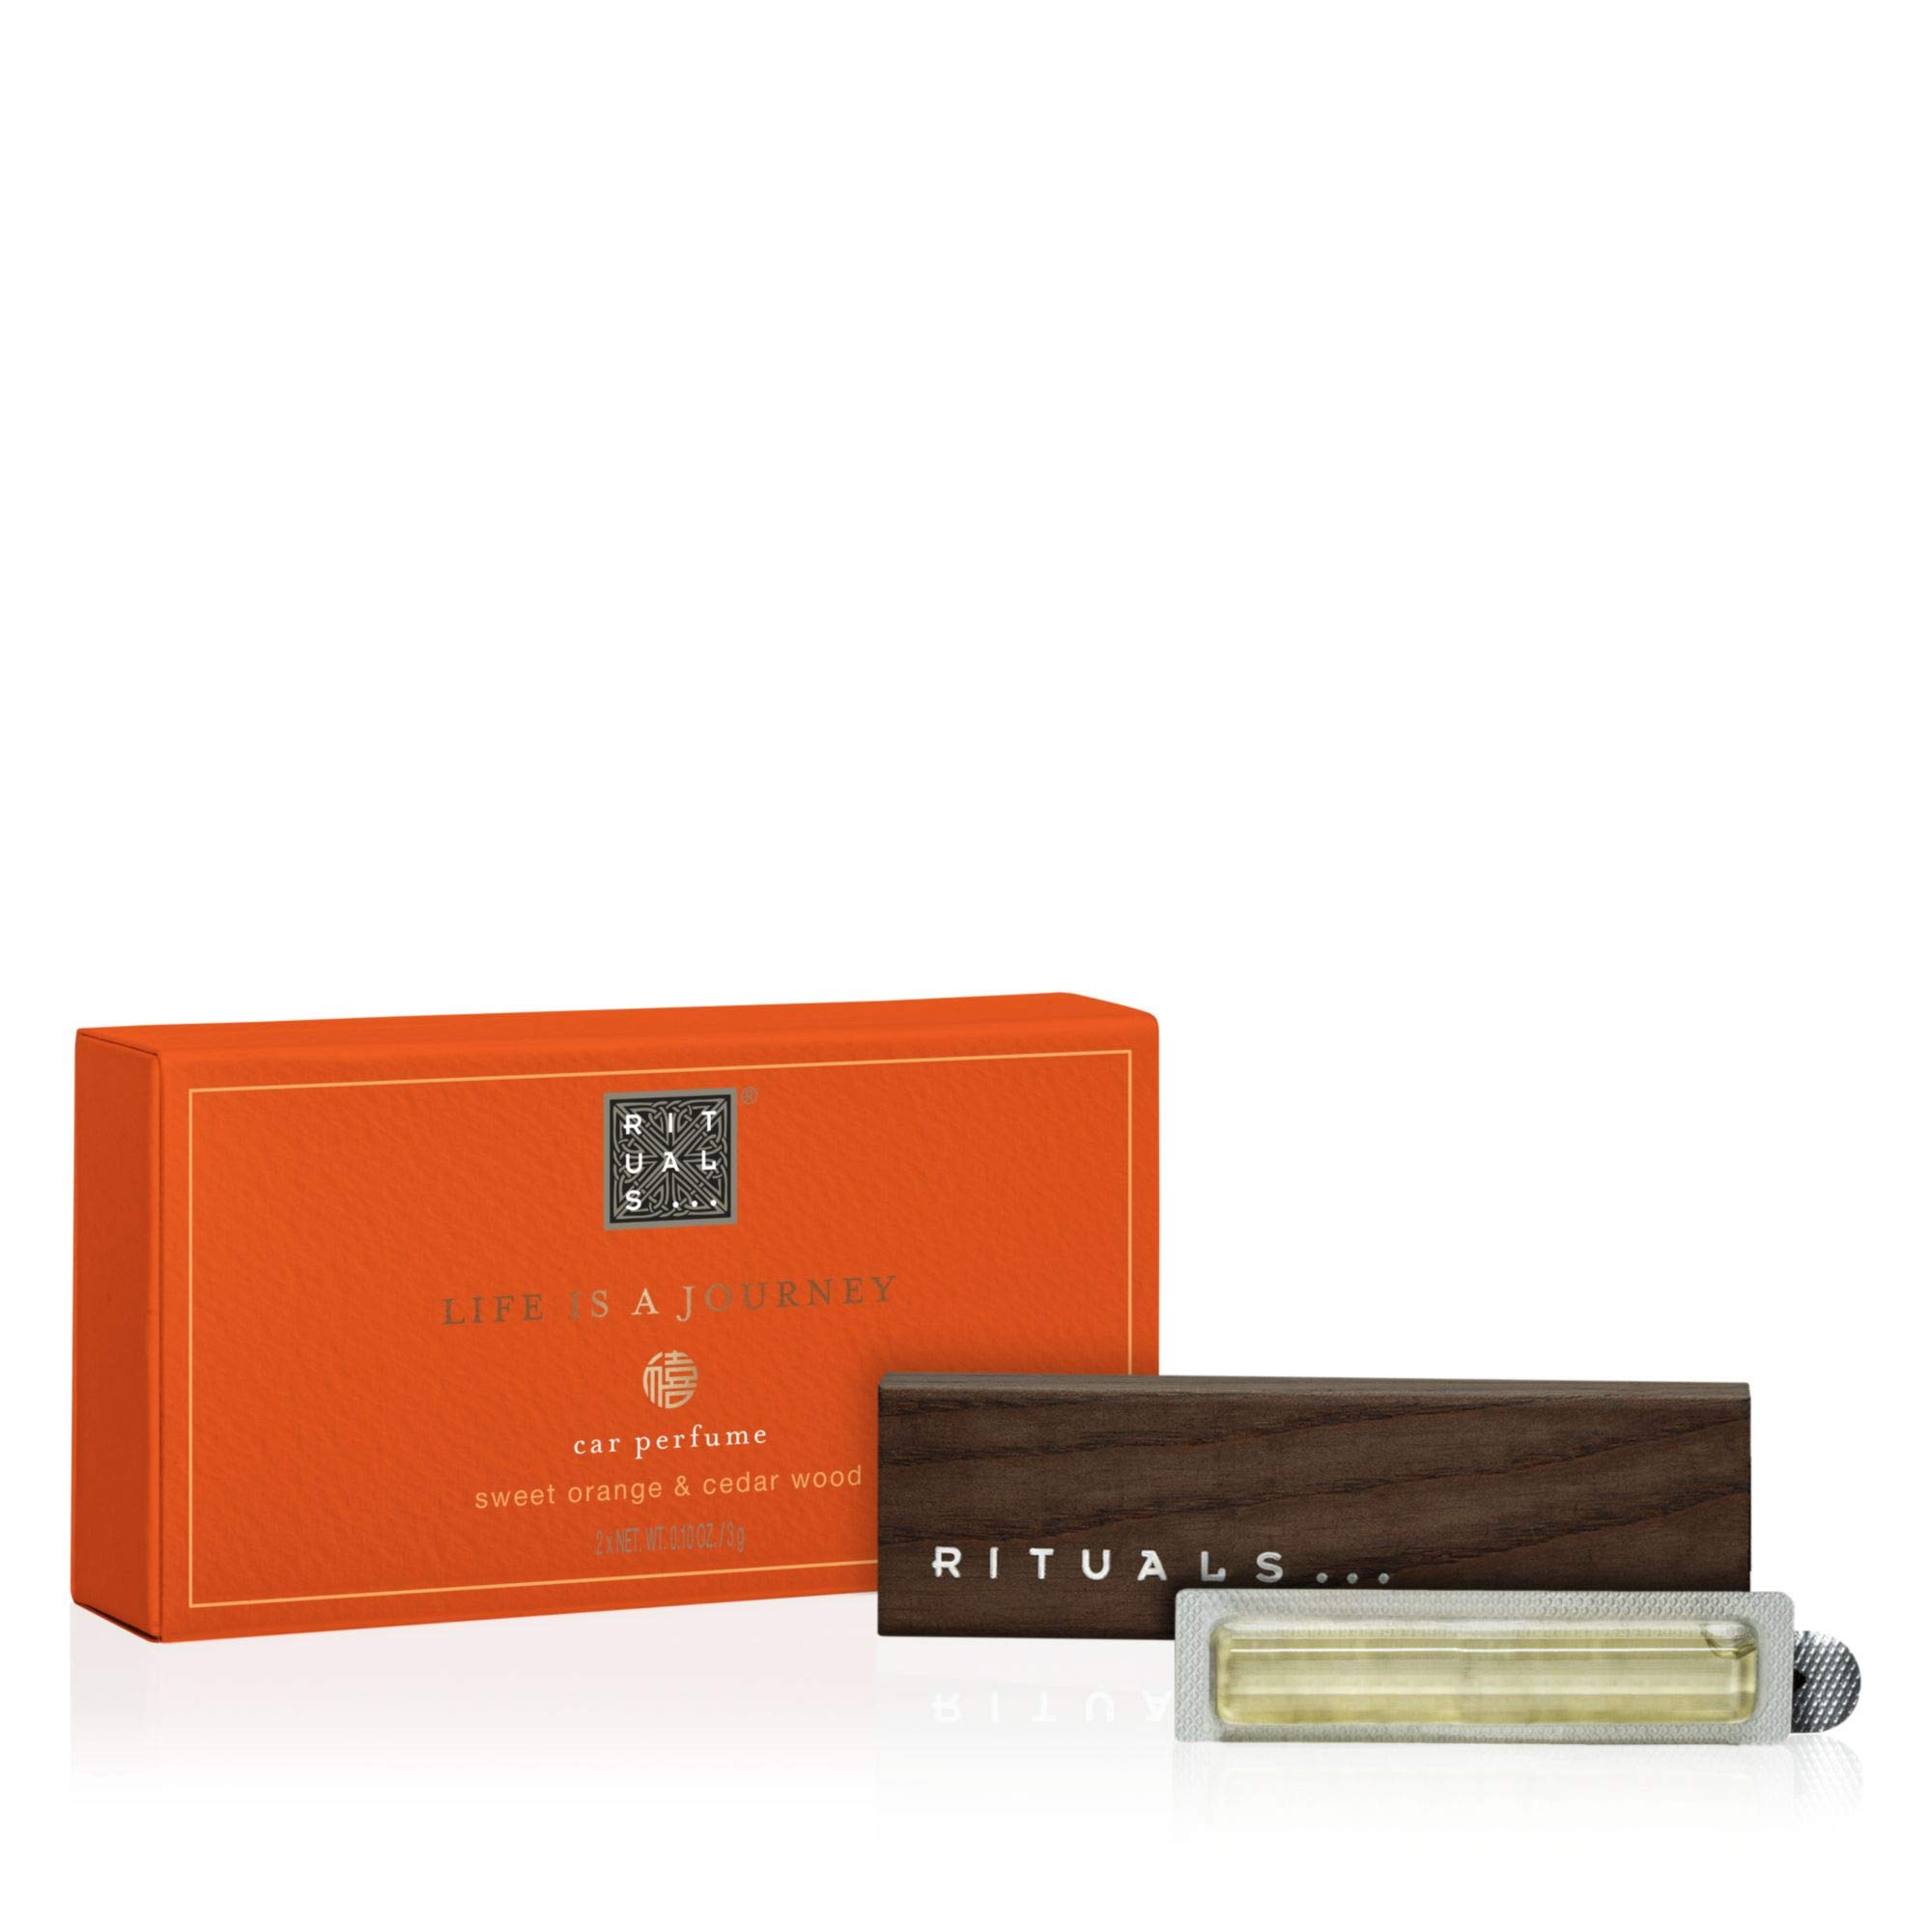 RITUALS The Rituals of Happy Buddha Car Perfume, 6gr